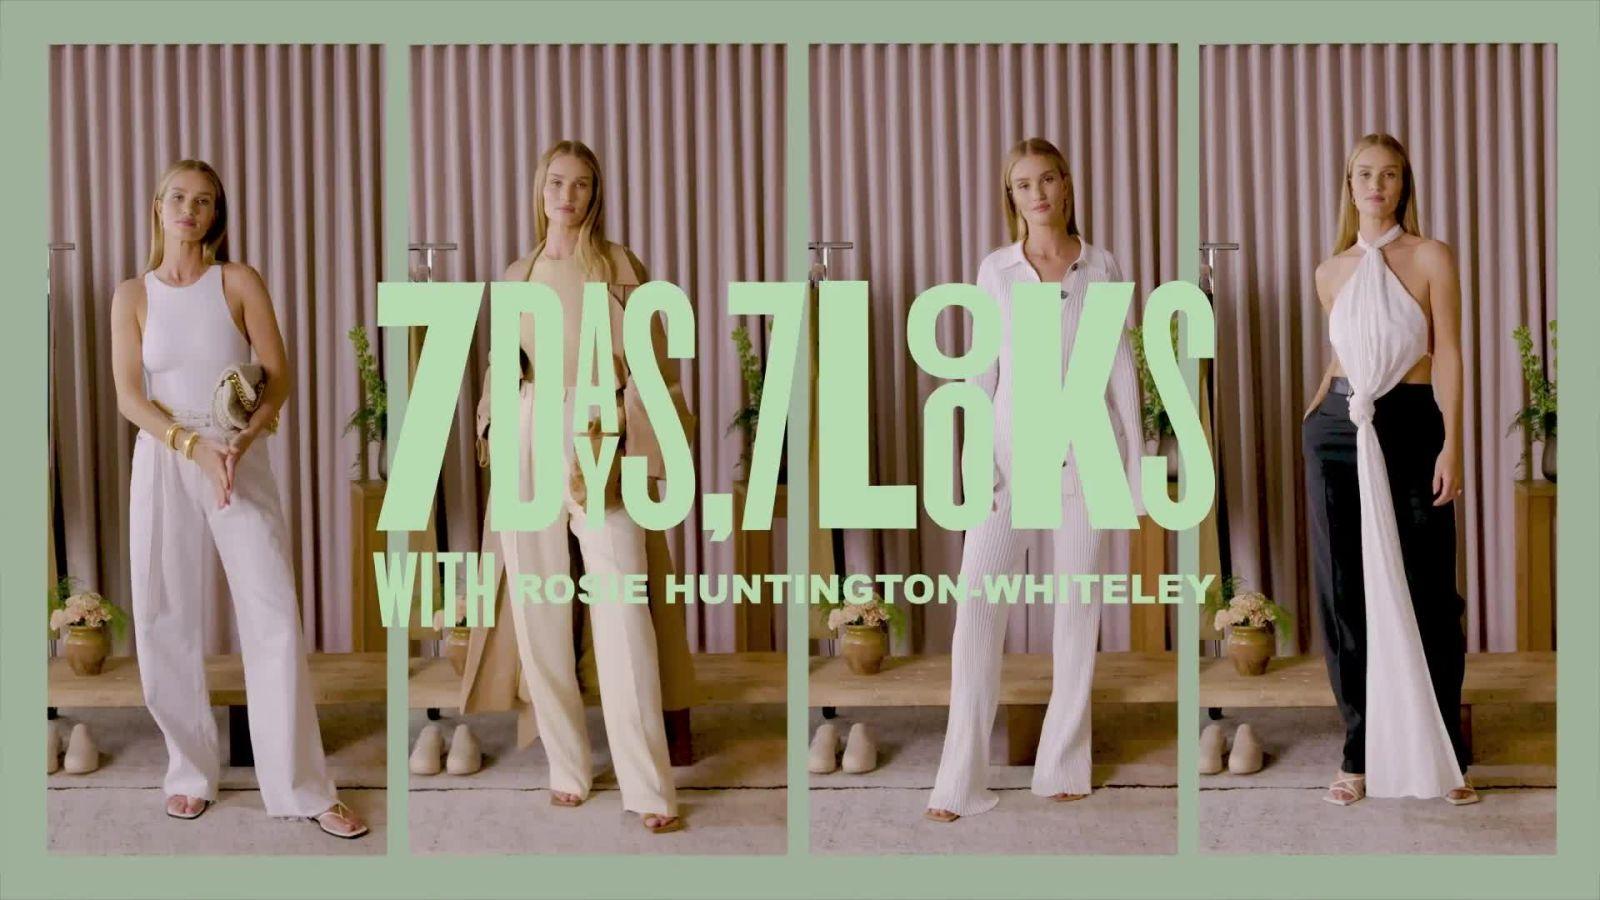 What Does Rosie Huntington-Whiteley Wear in a Week? A Plethora of Sleek, Minimalist Essentials